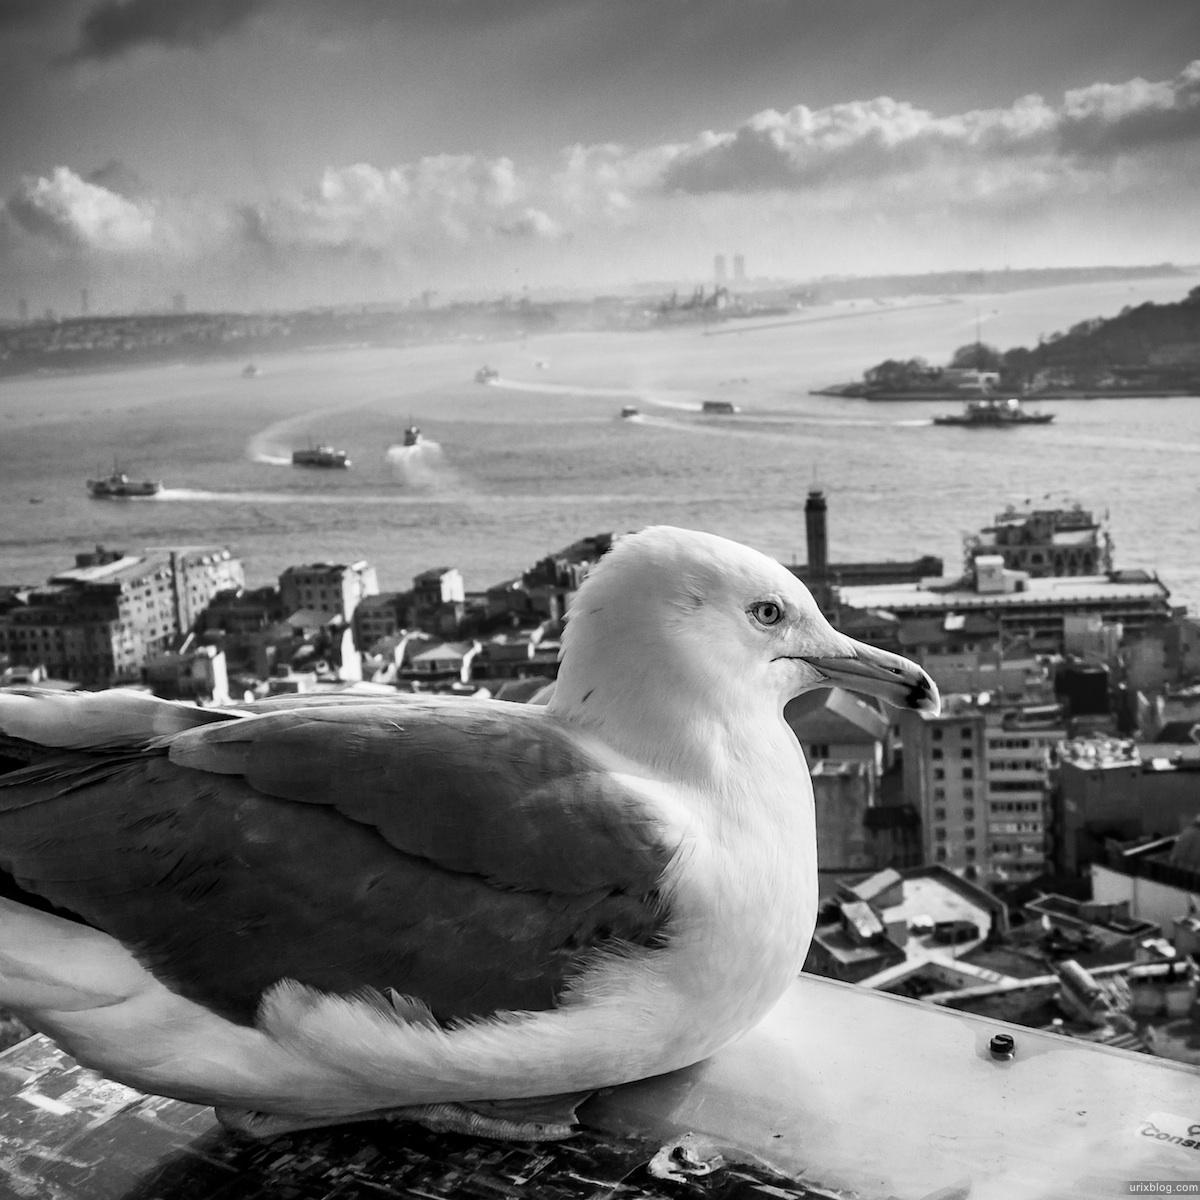 2013, Чайка, Галатская башня, панорама, Босфор, Босфорский пролив, Стамбул, Турция, море, корабли, зима